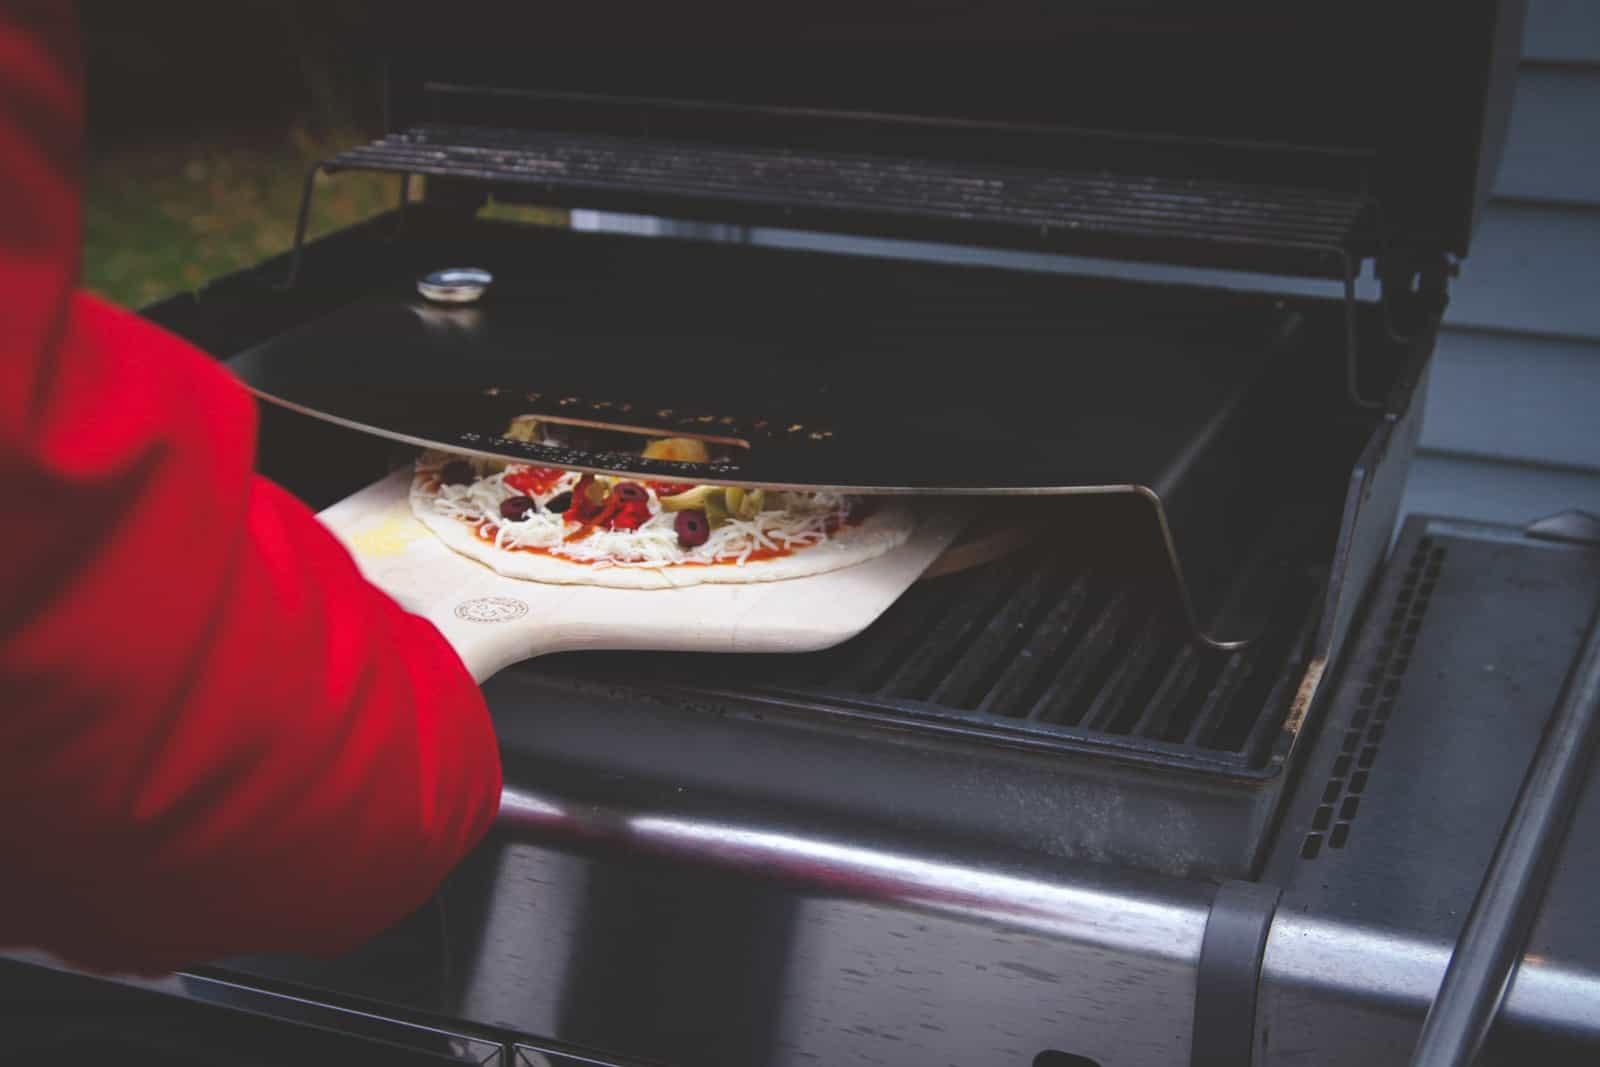 Using a Kettlepizza gas pro grill attachment to make pizza